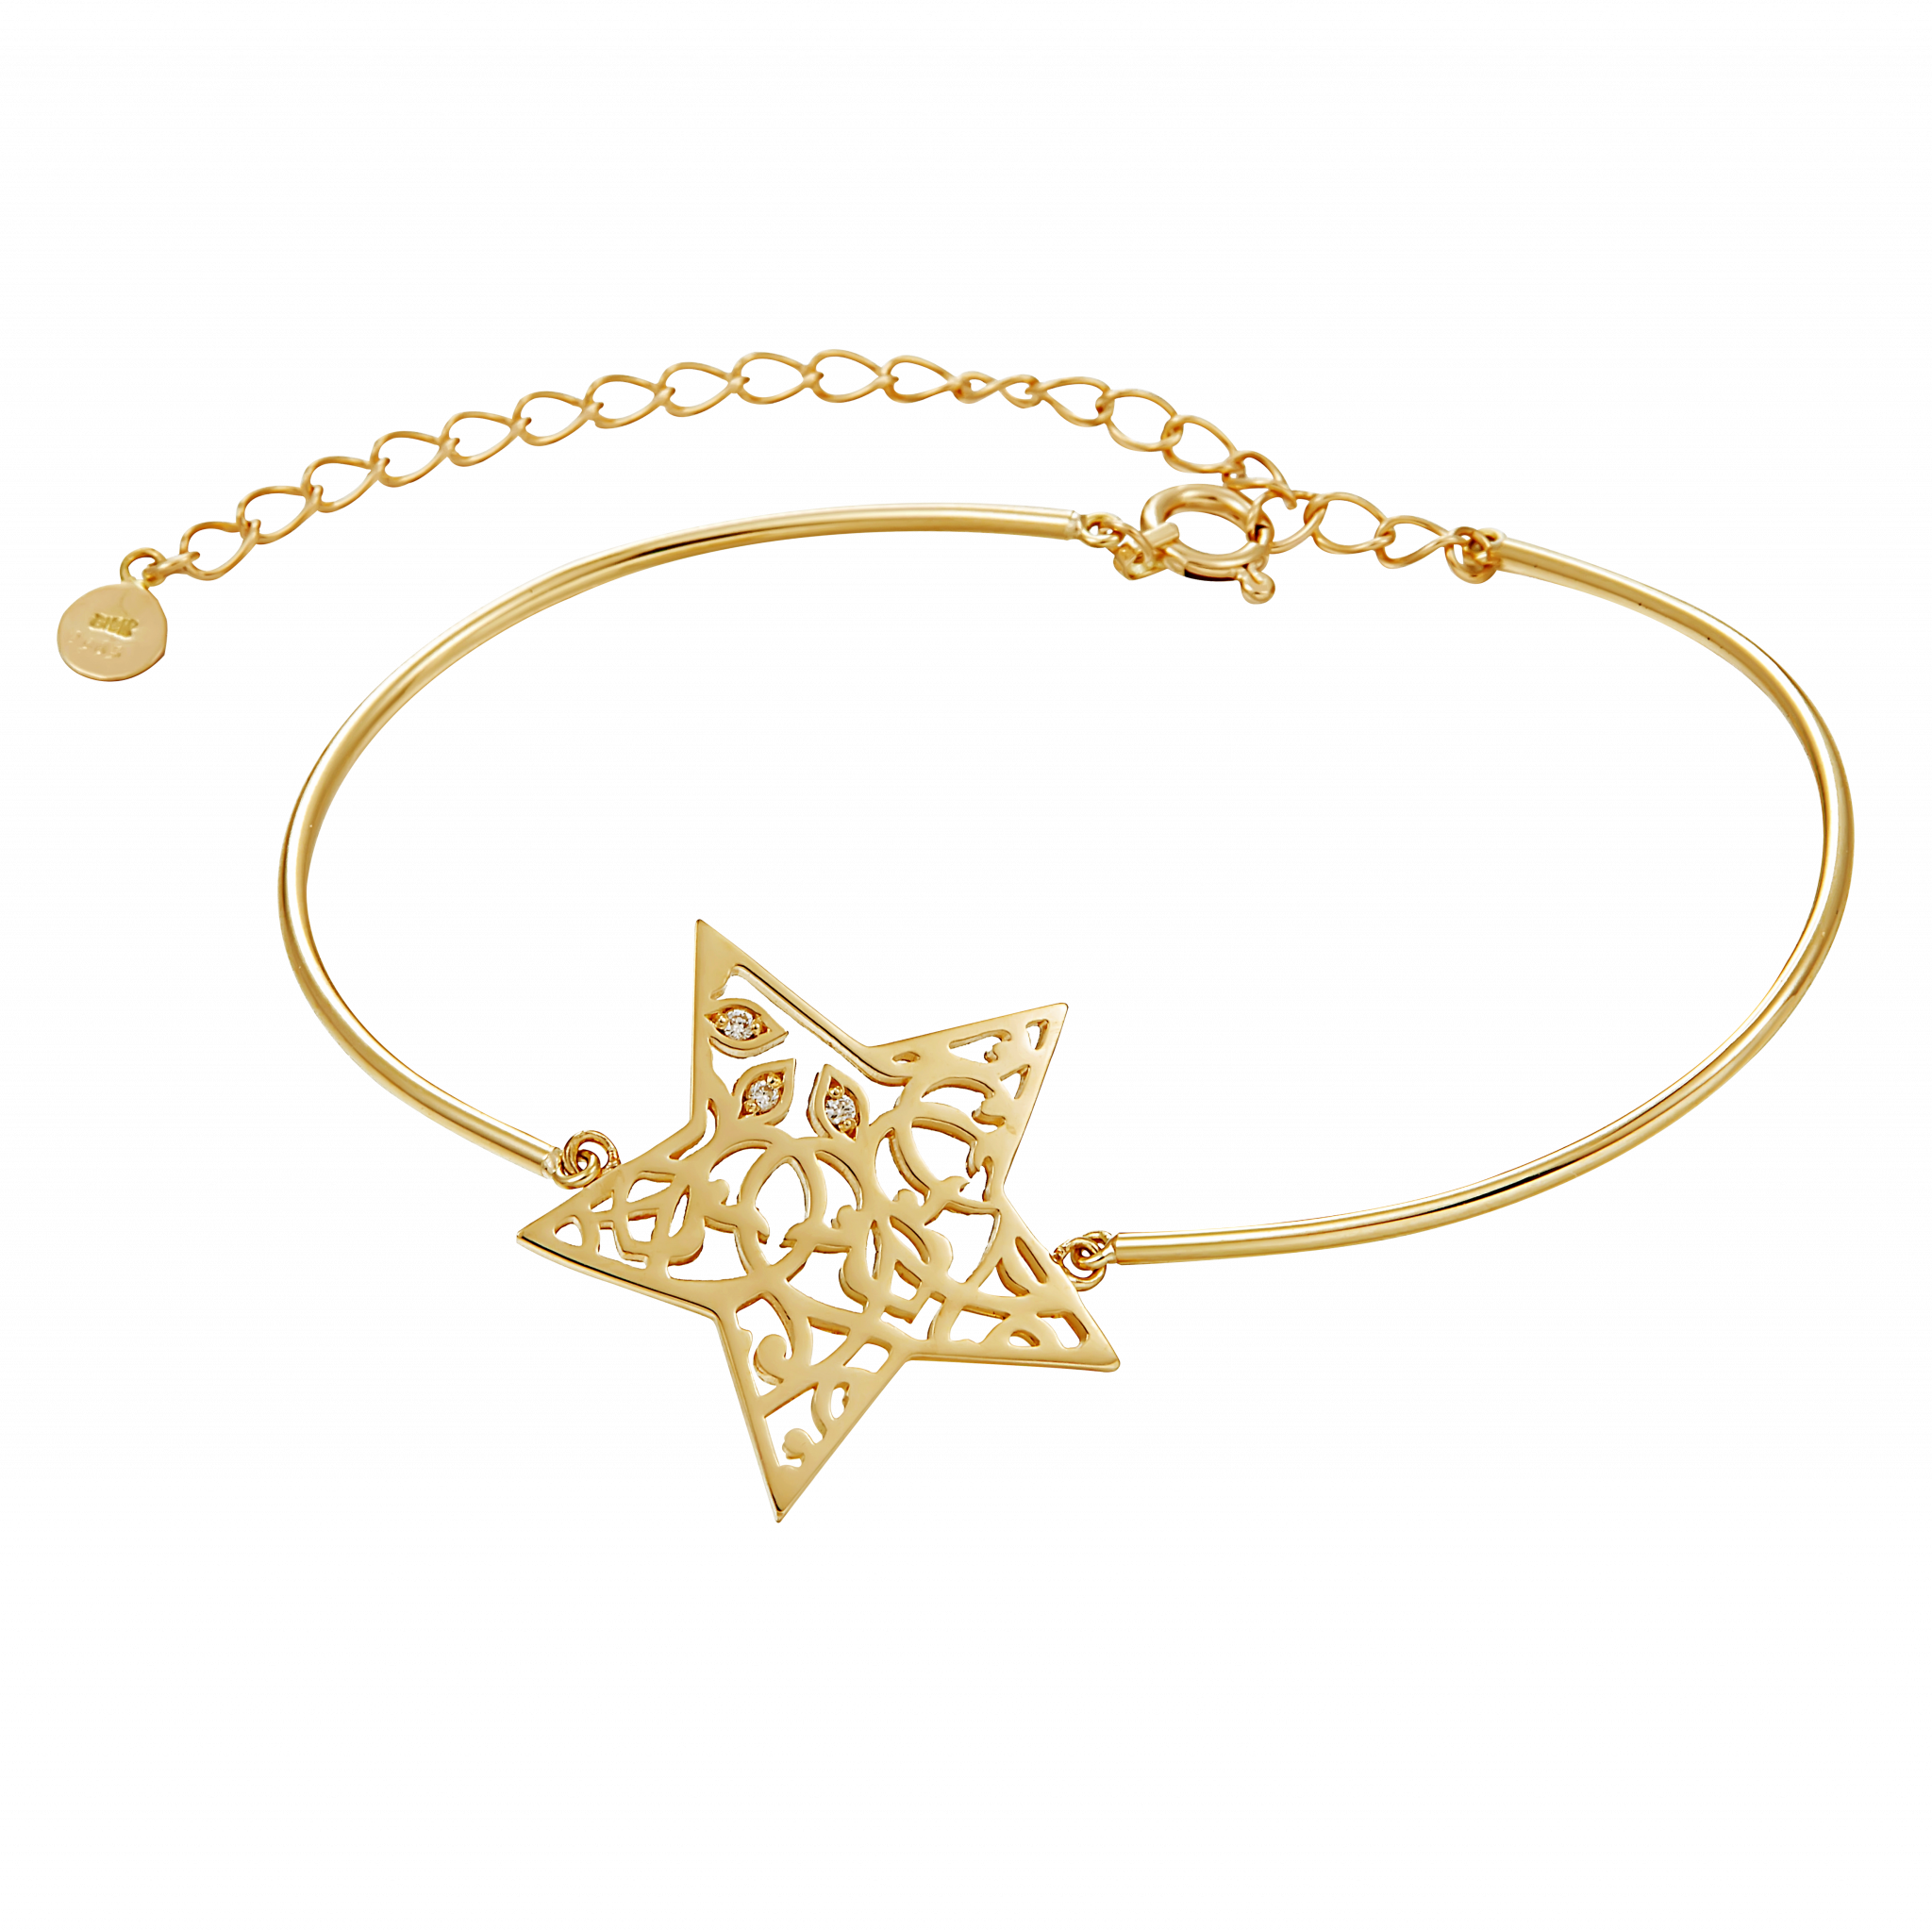 Star of Bethlehem Collection 18K黄金手链 9999